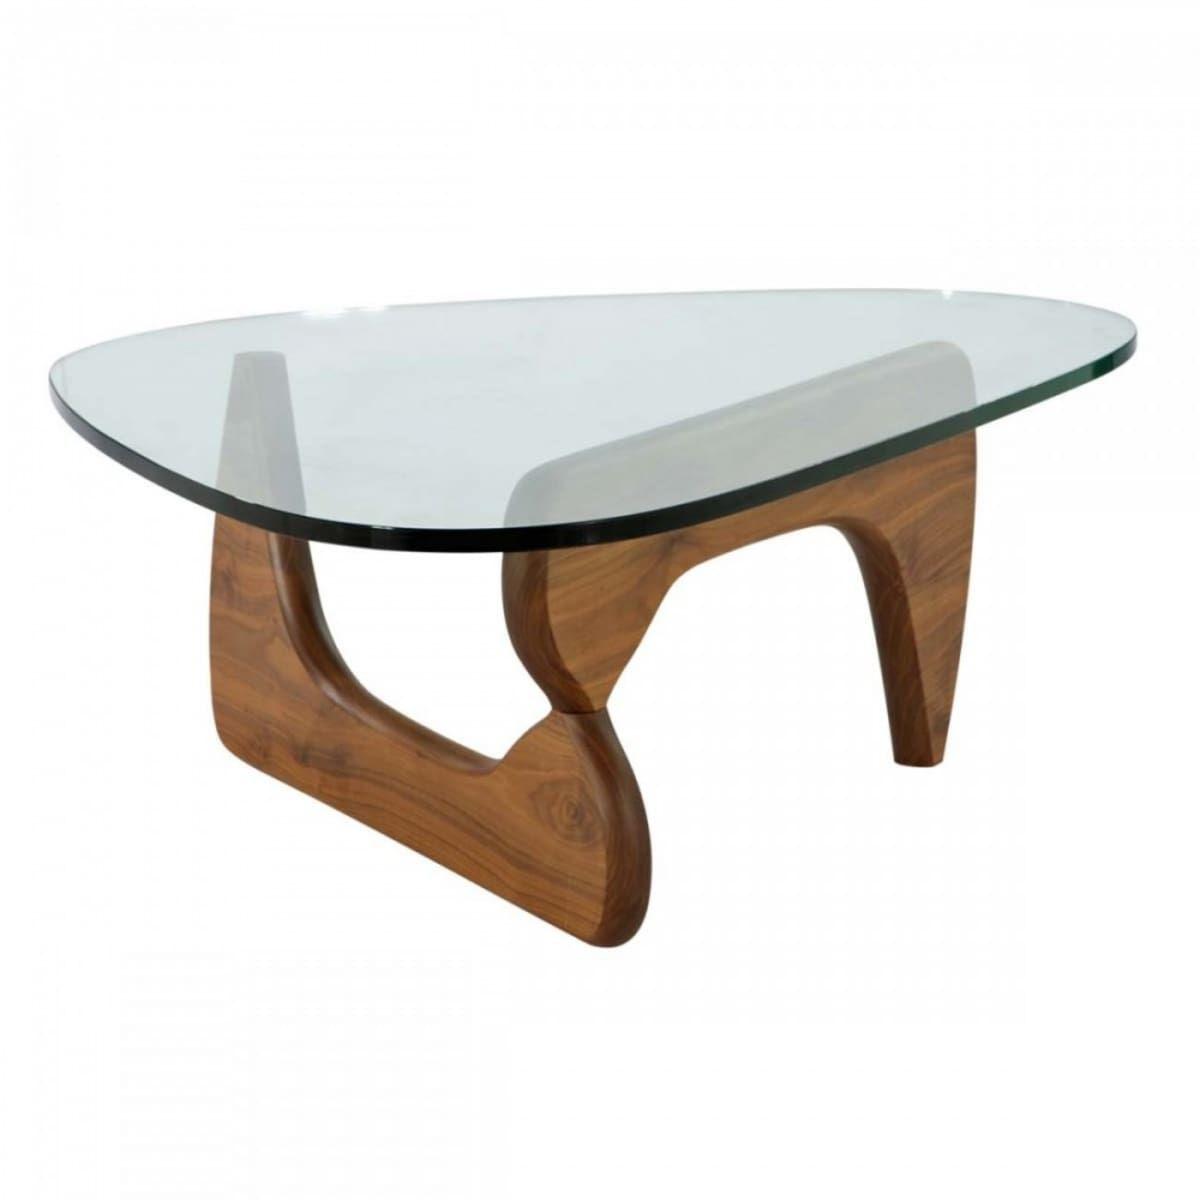 Noguchi Style Coffee Table Light Walnut 549 Free Shipping Wood